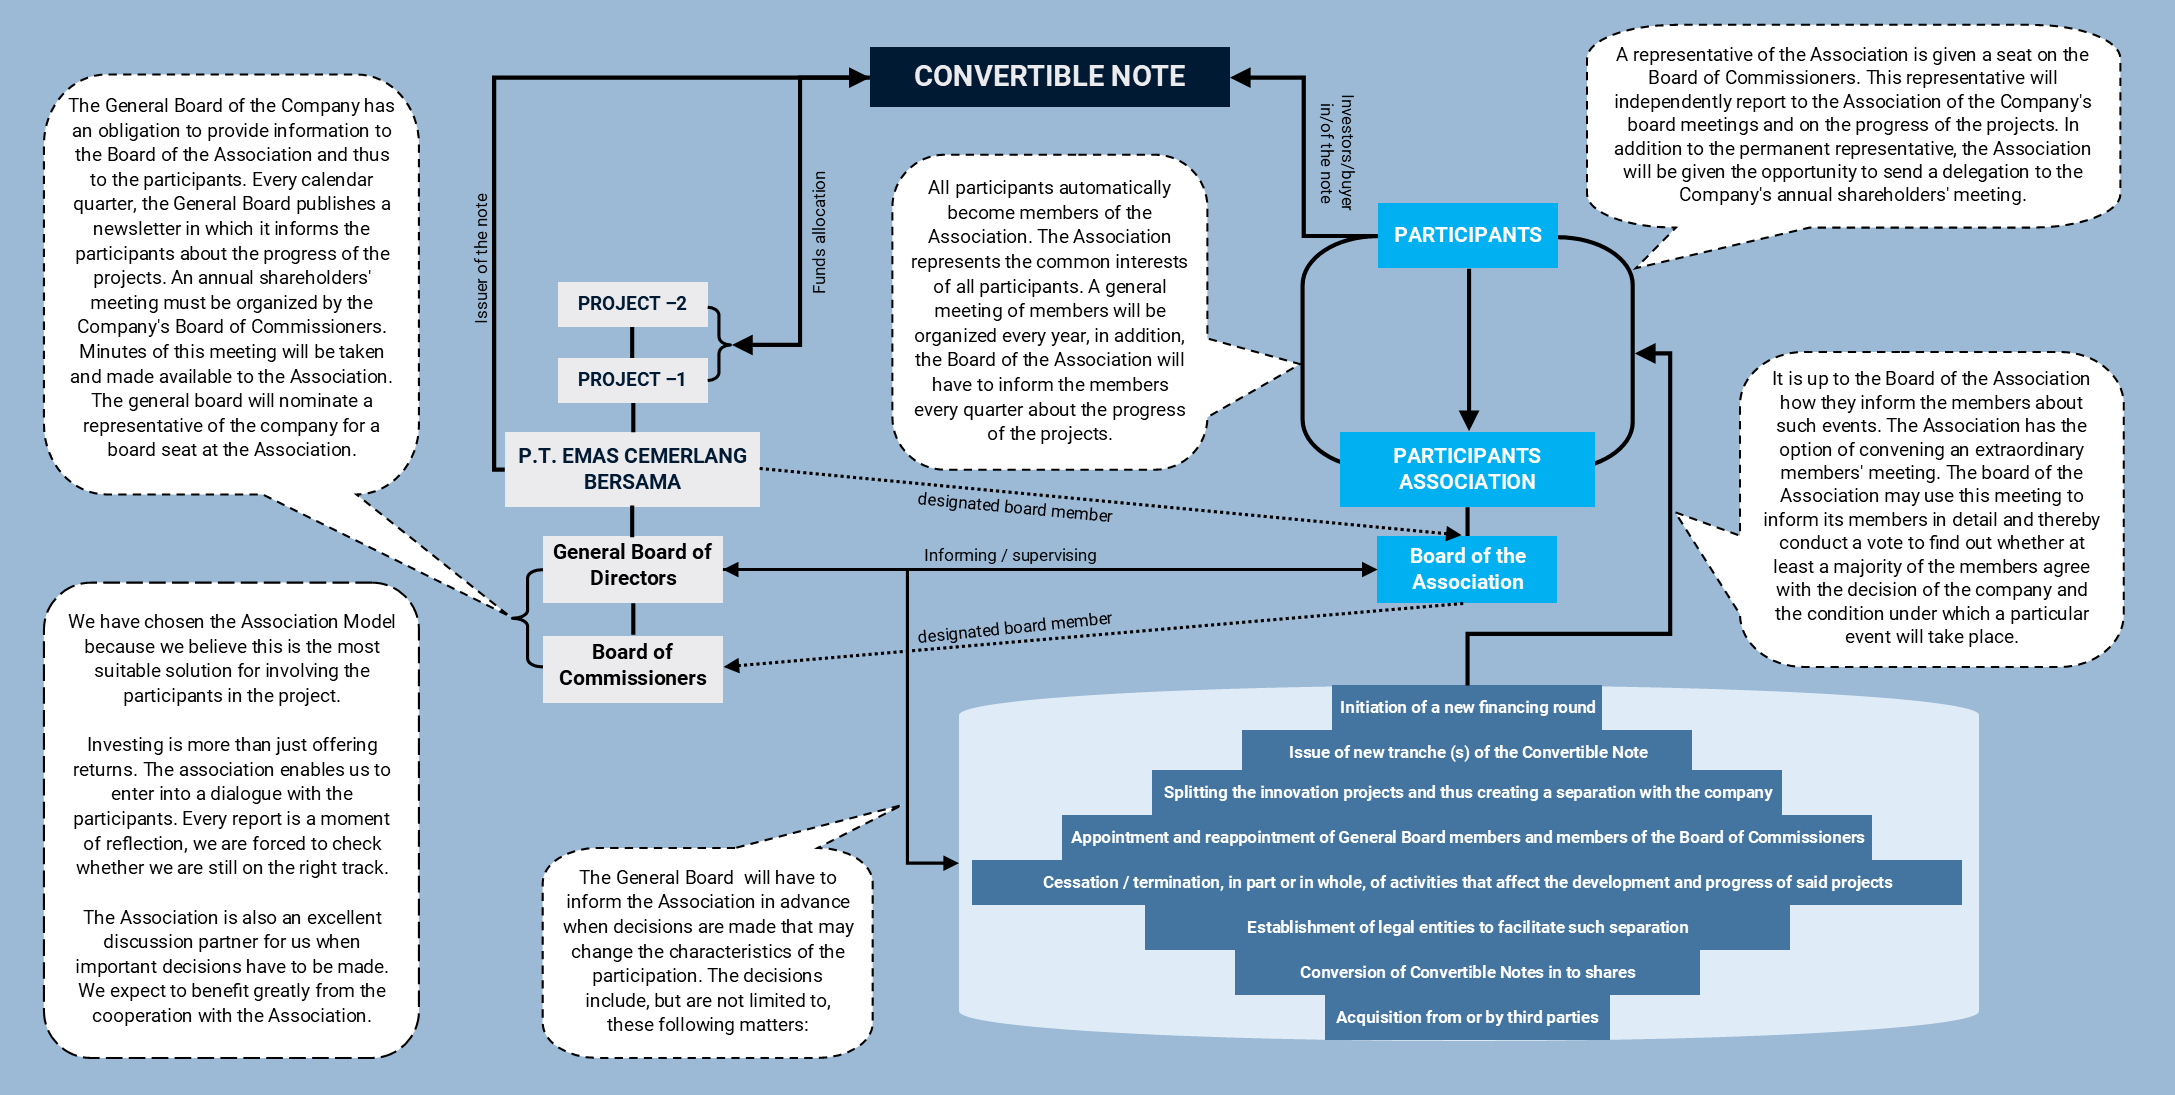 Startup Association explained